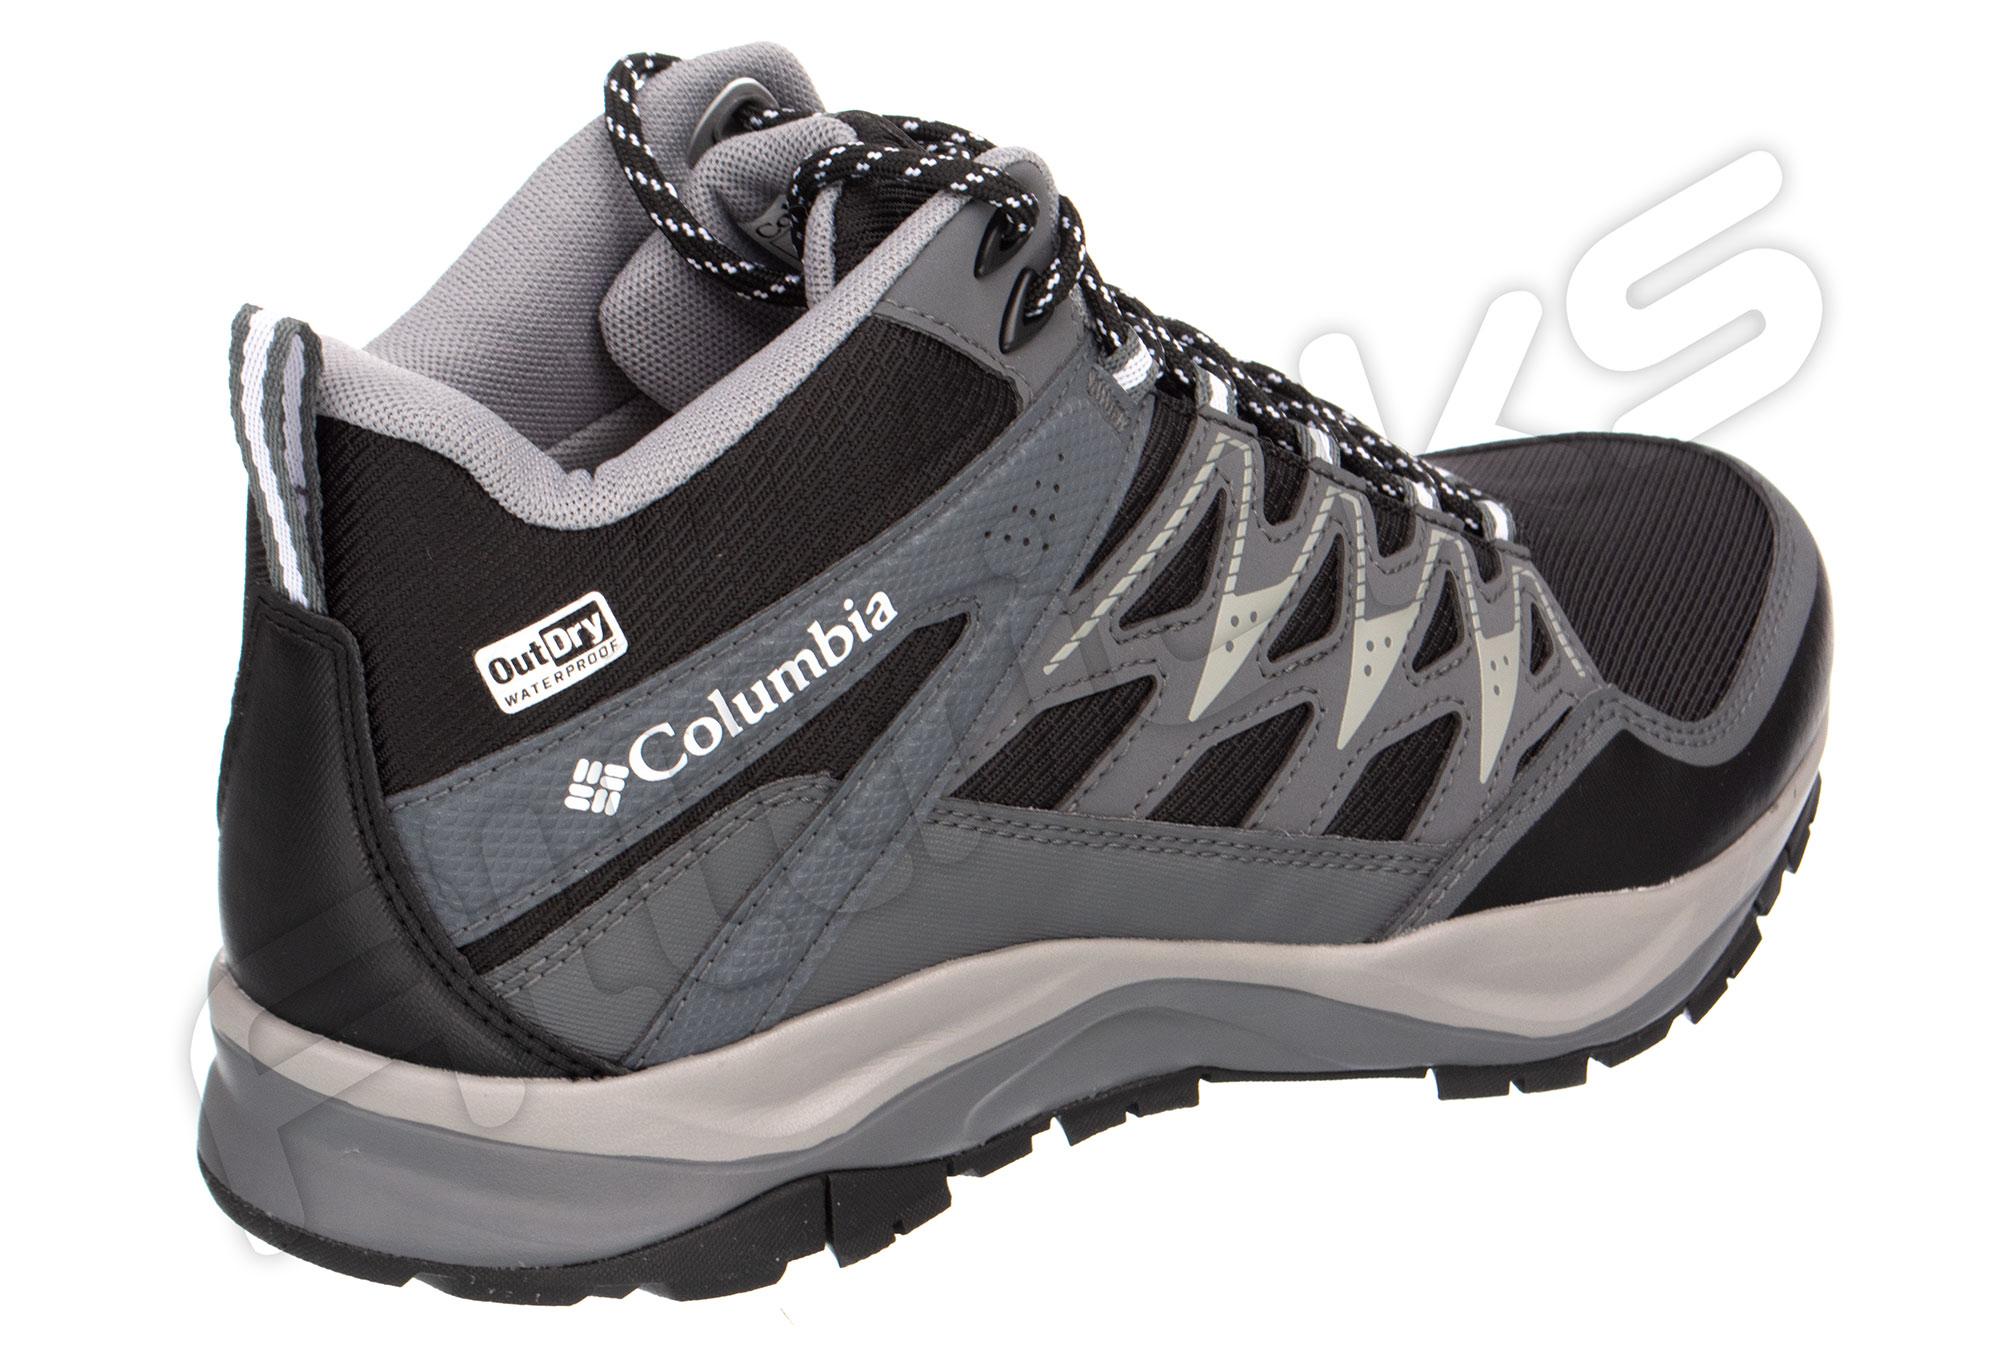 Outdry Mid Negro Blanco Zapatos Columbia Wayfinder dWBrCexo